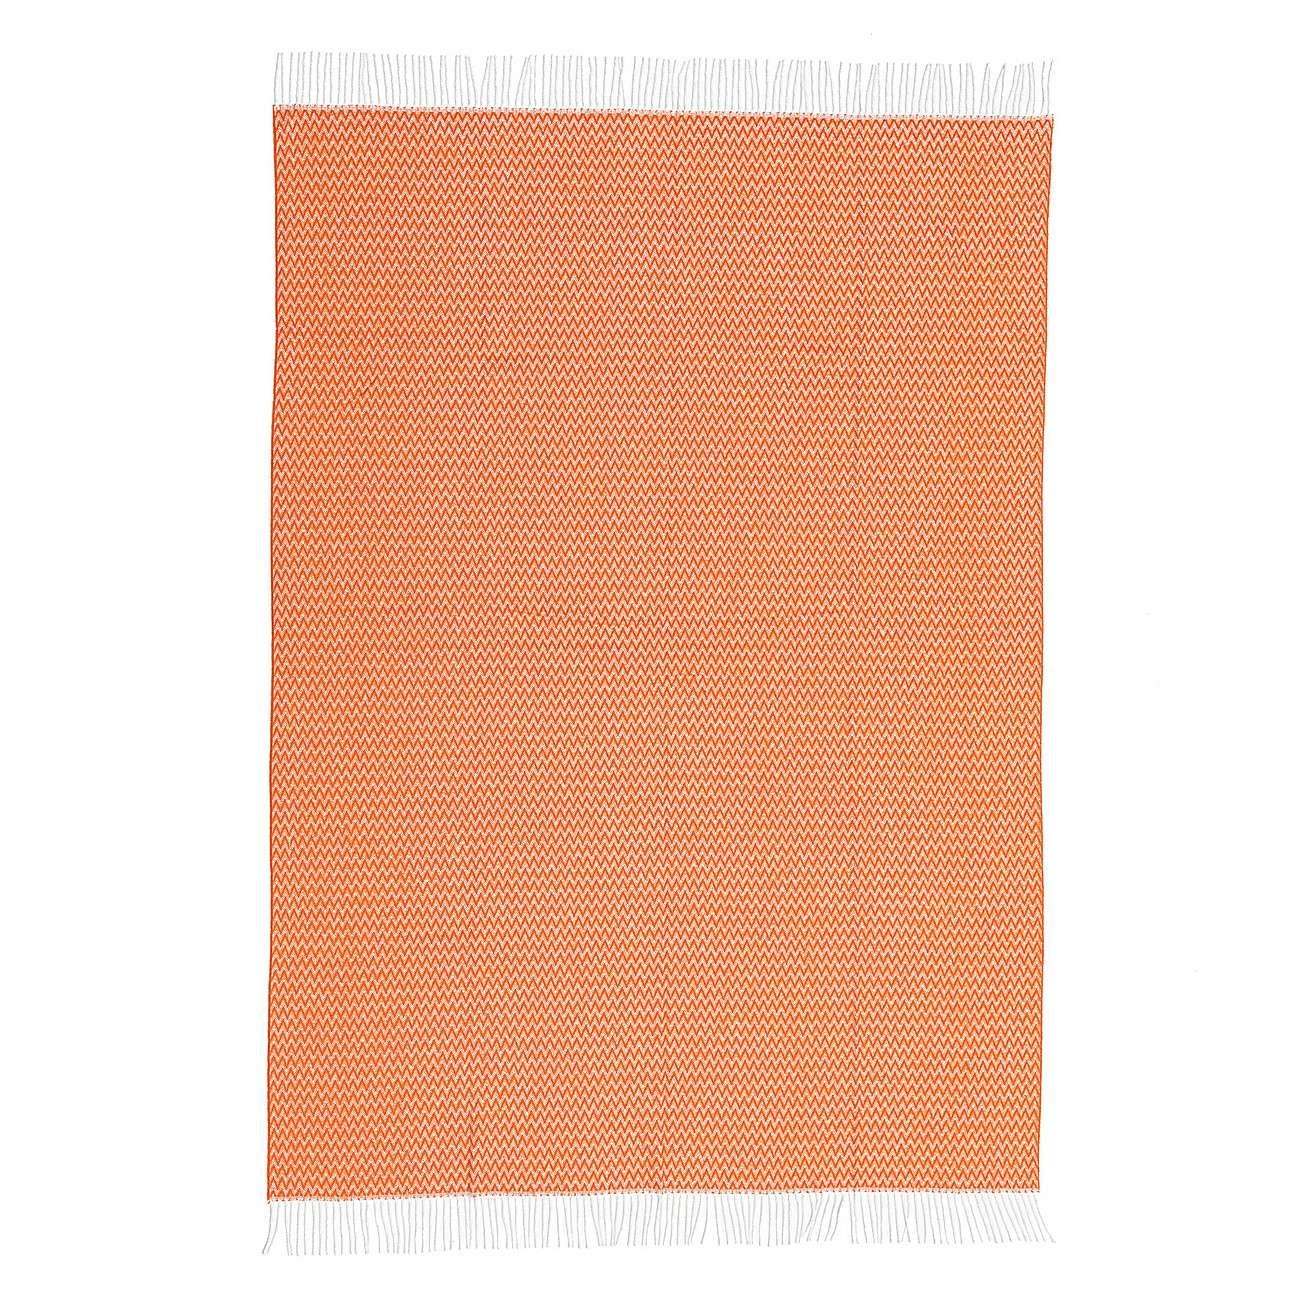 Pled Ibiza 140x200cm orange chevron